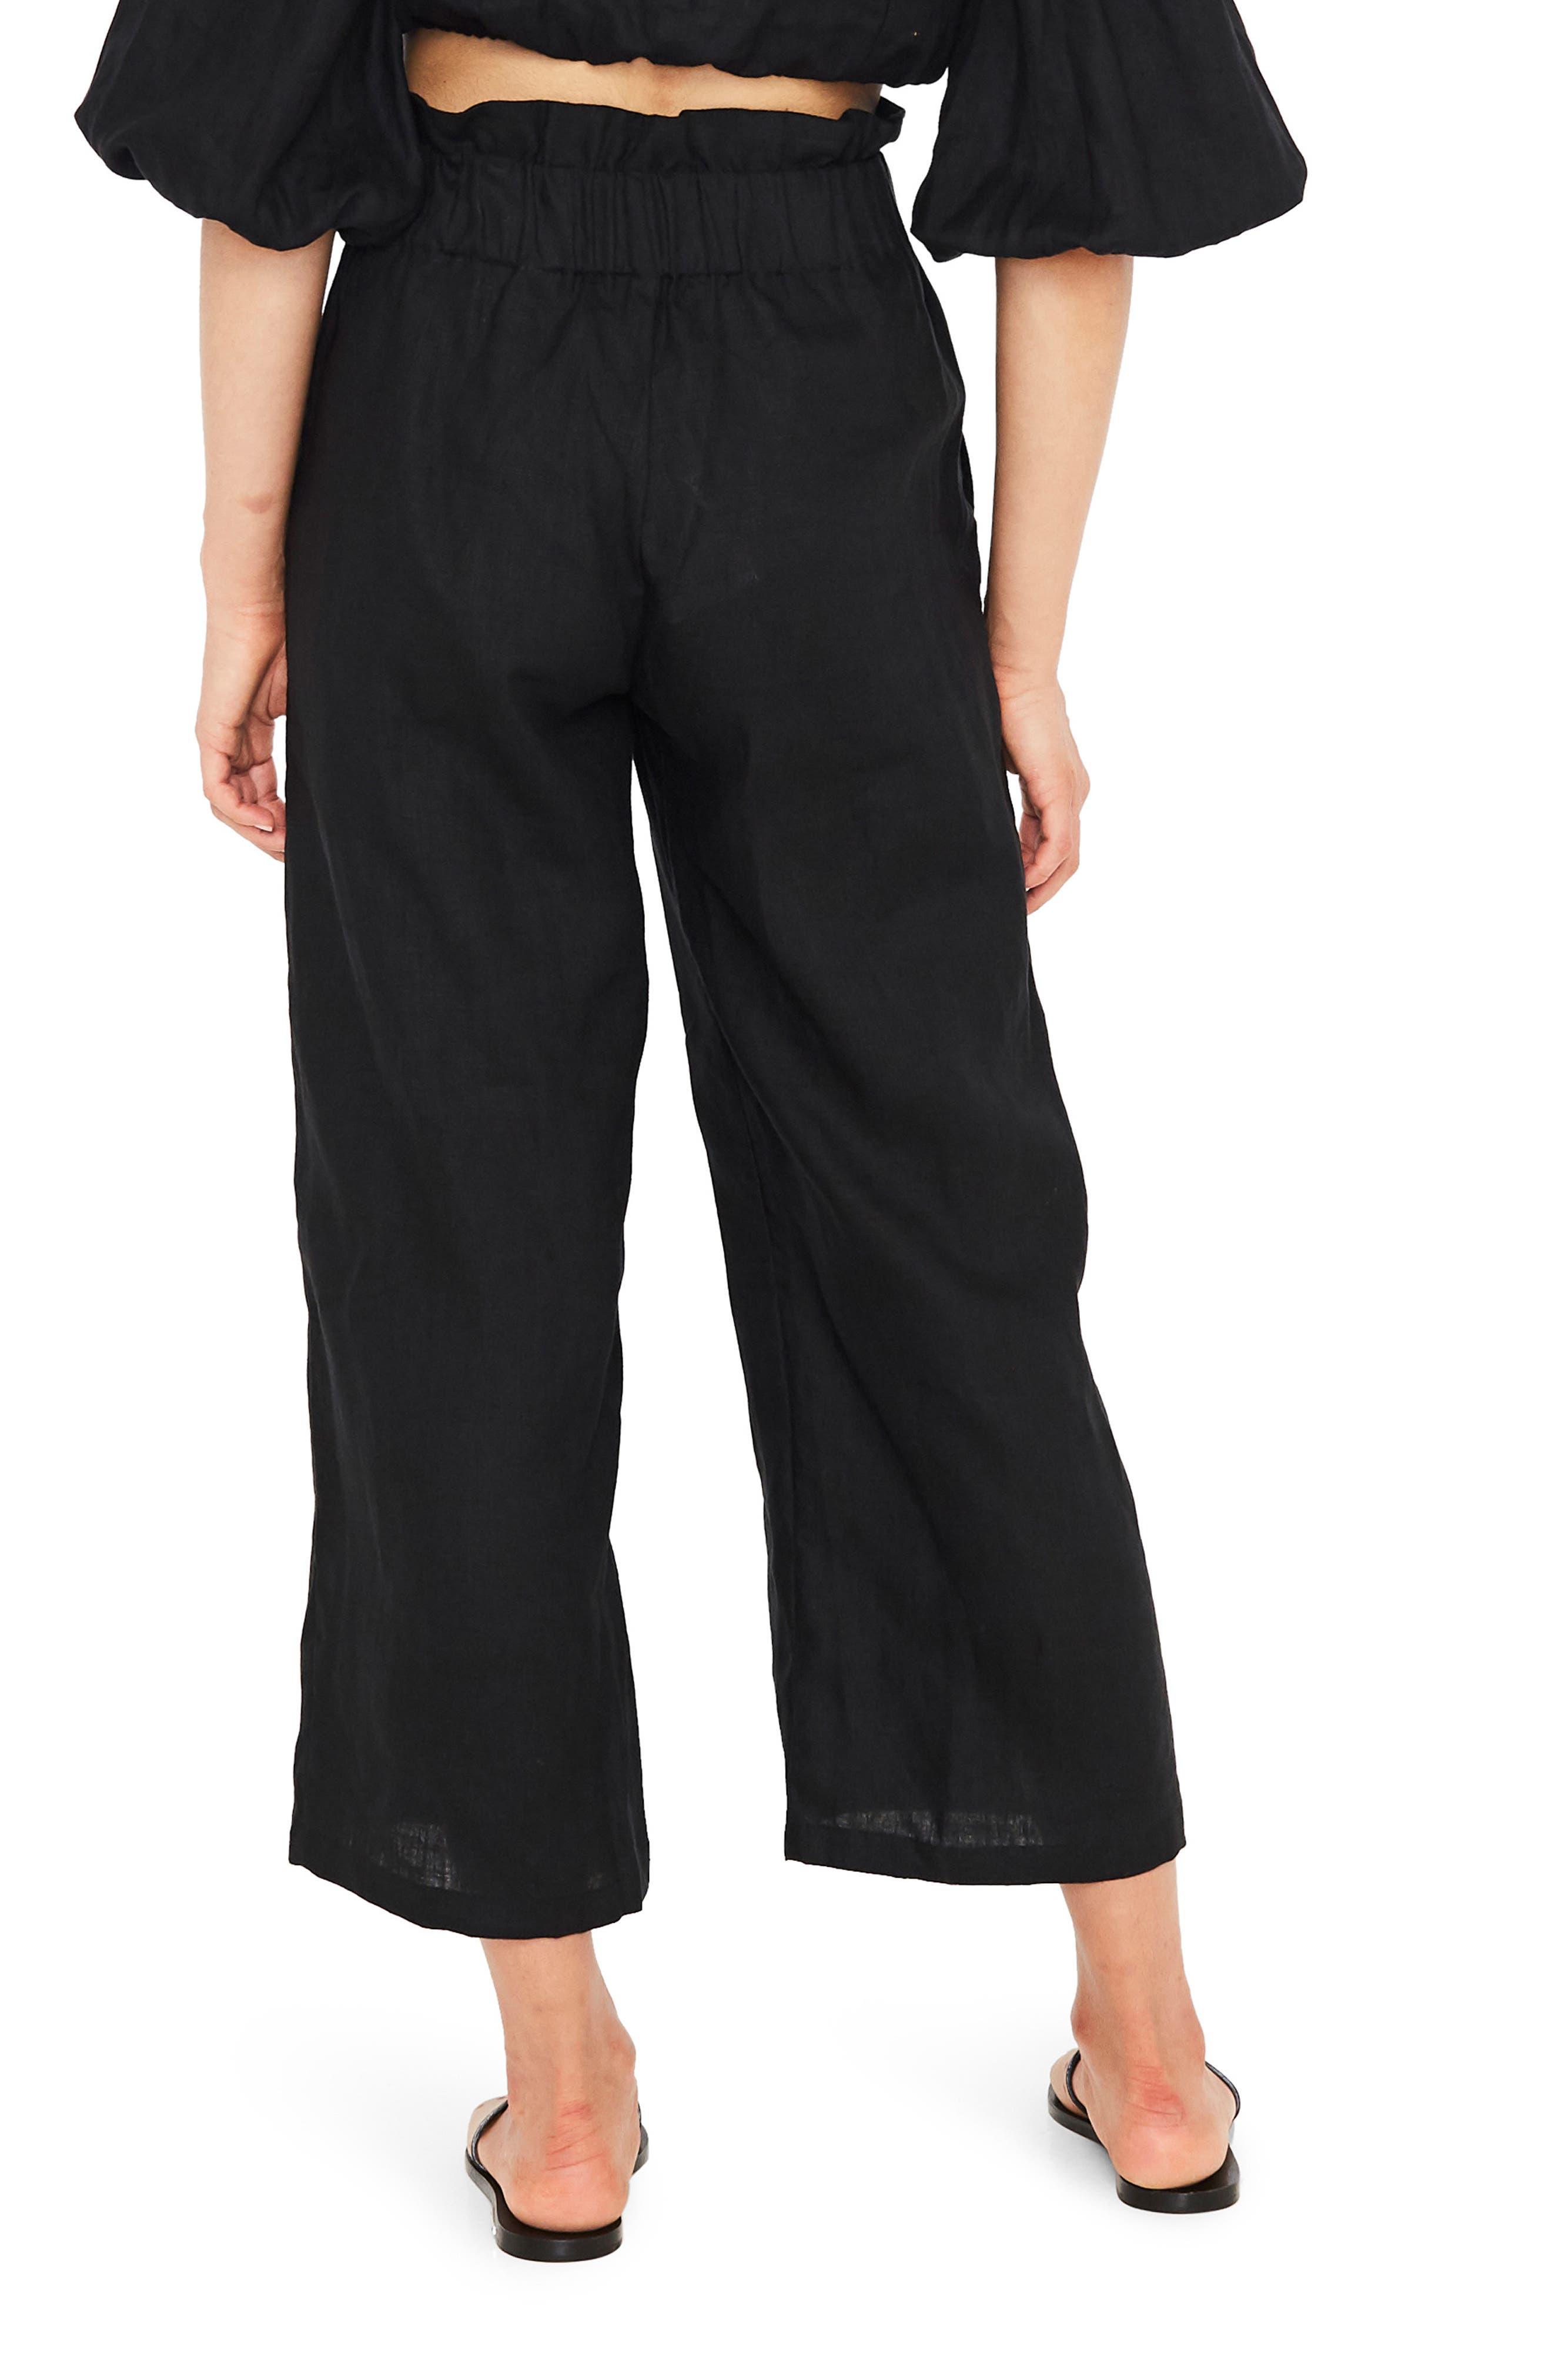 Varadero High Waist Linen Pants,                             Alternate thumbnail 2, color,                             001